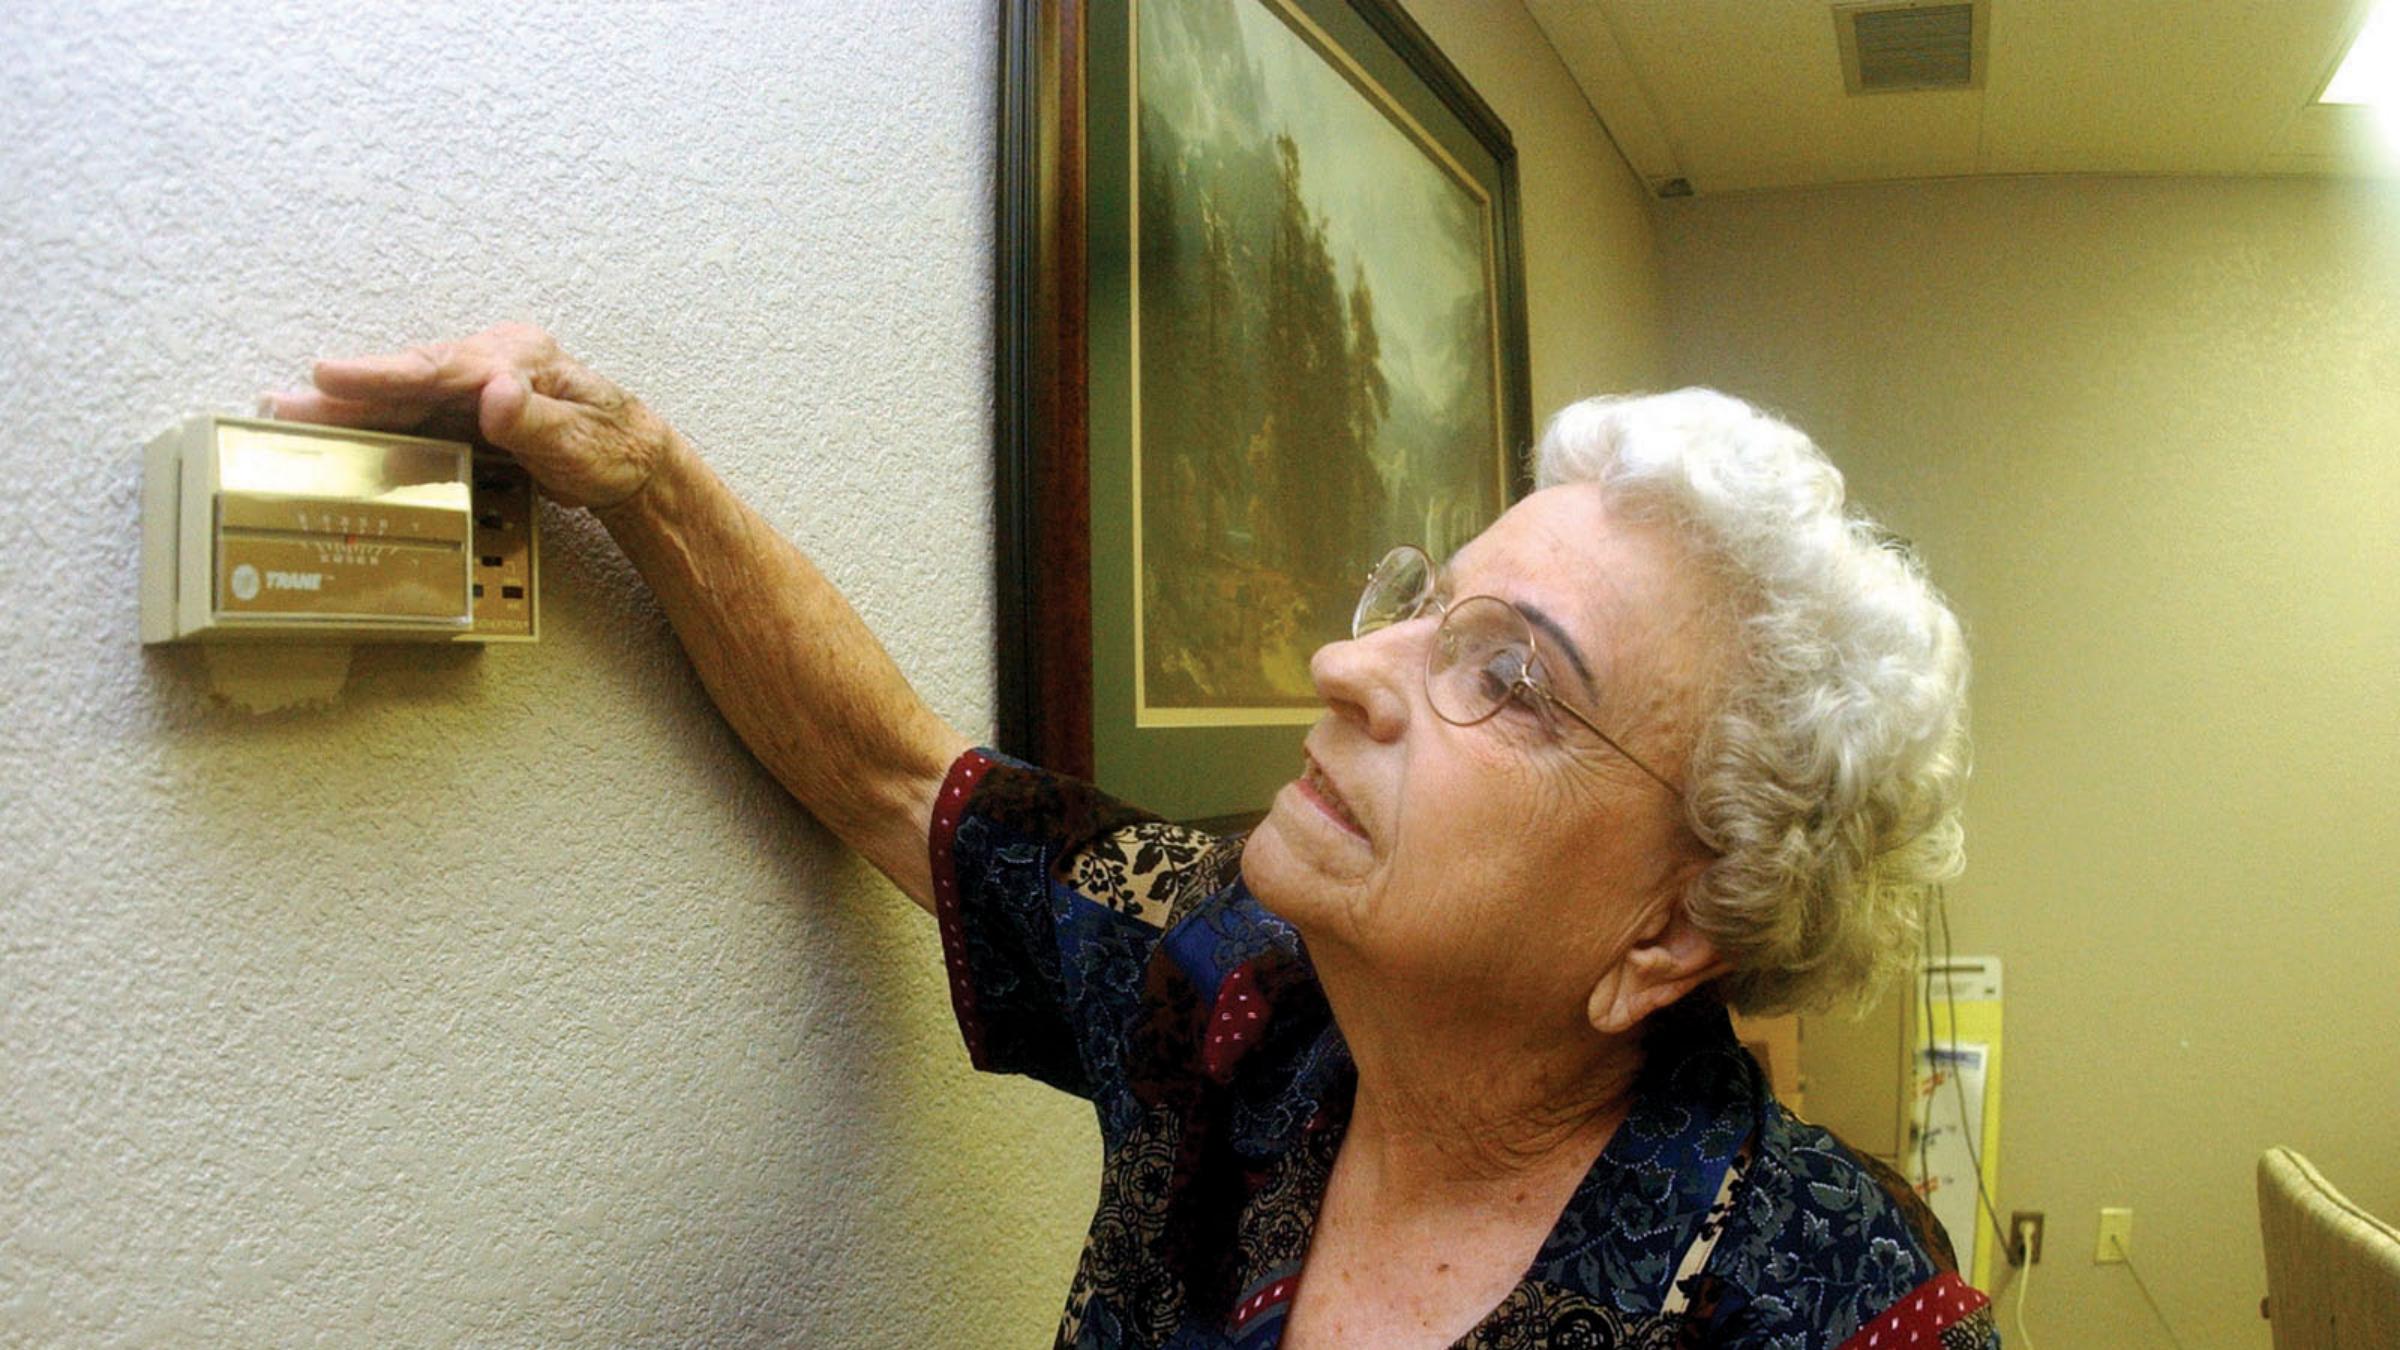 Bobbye Allen of Lovington, N.M., adjusts her thermostat.